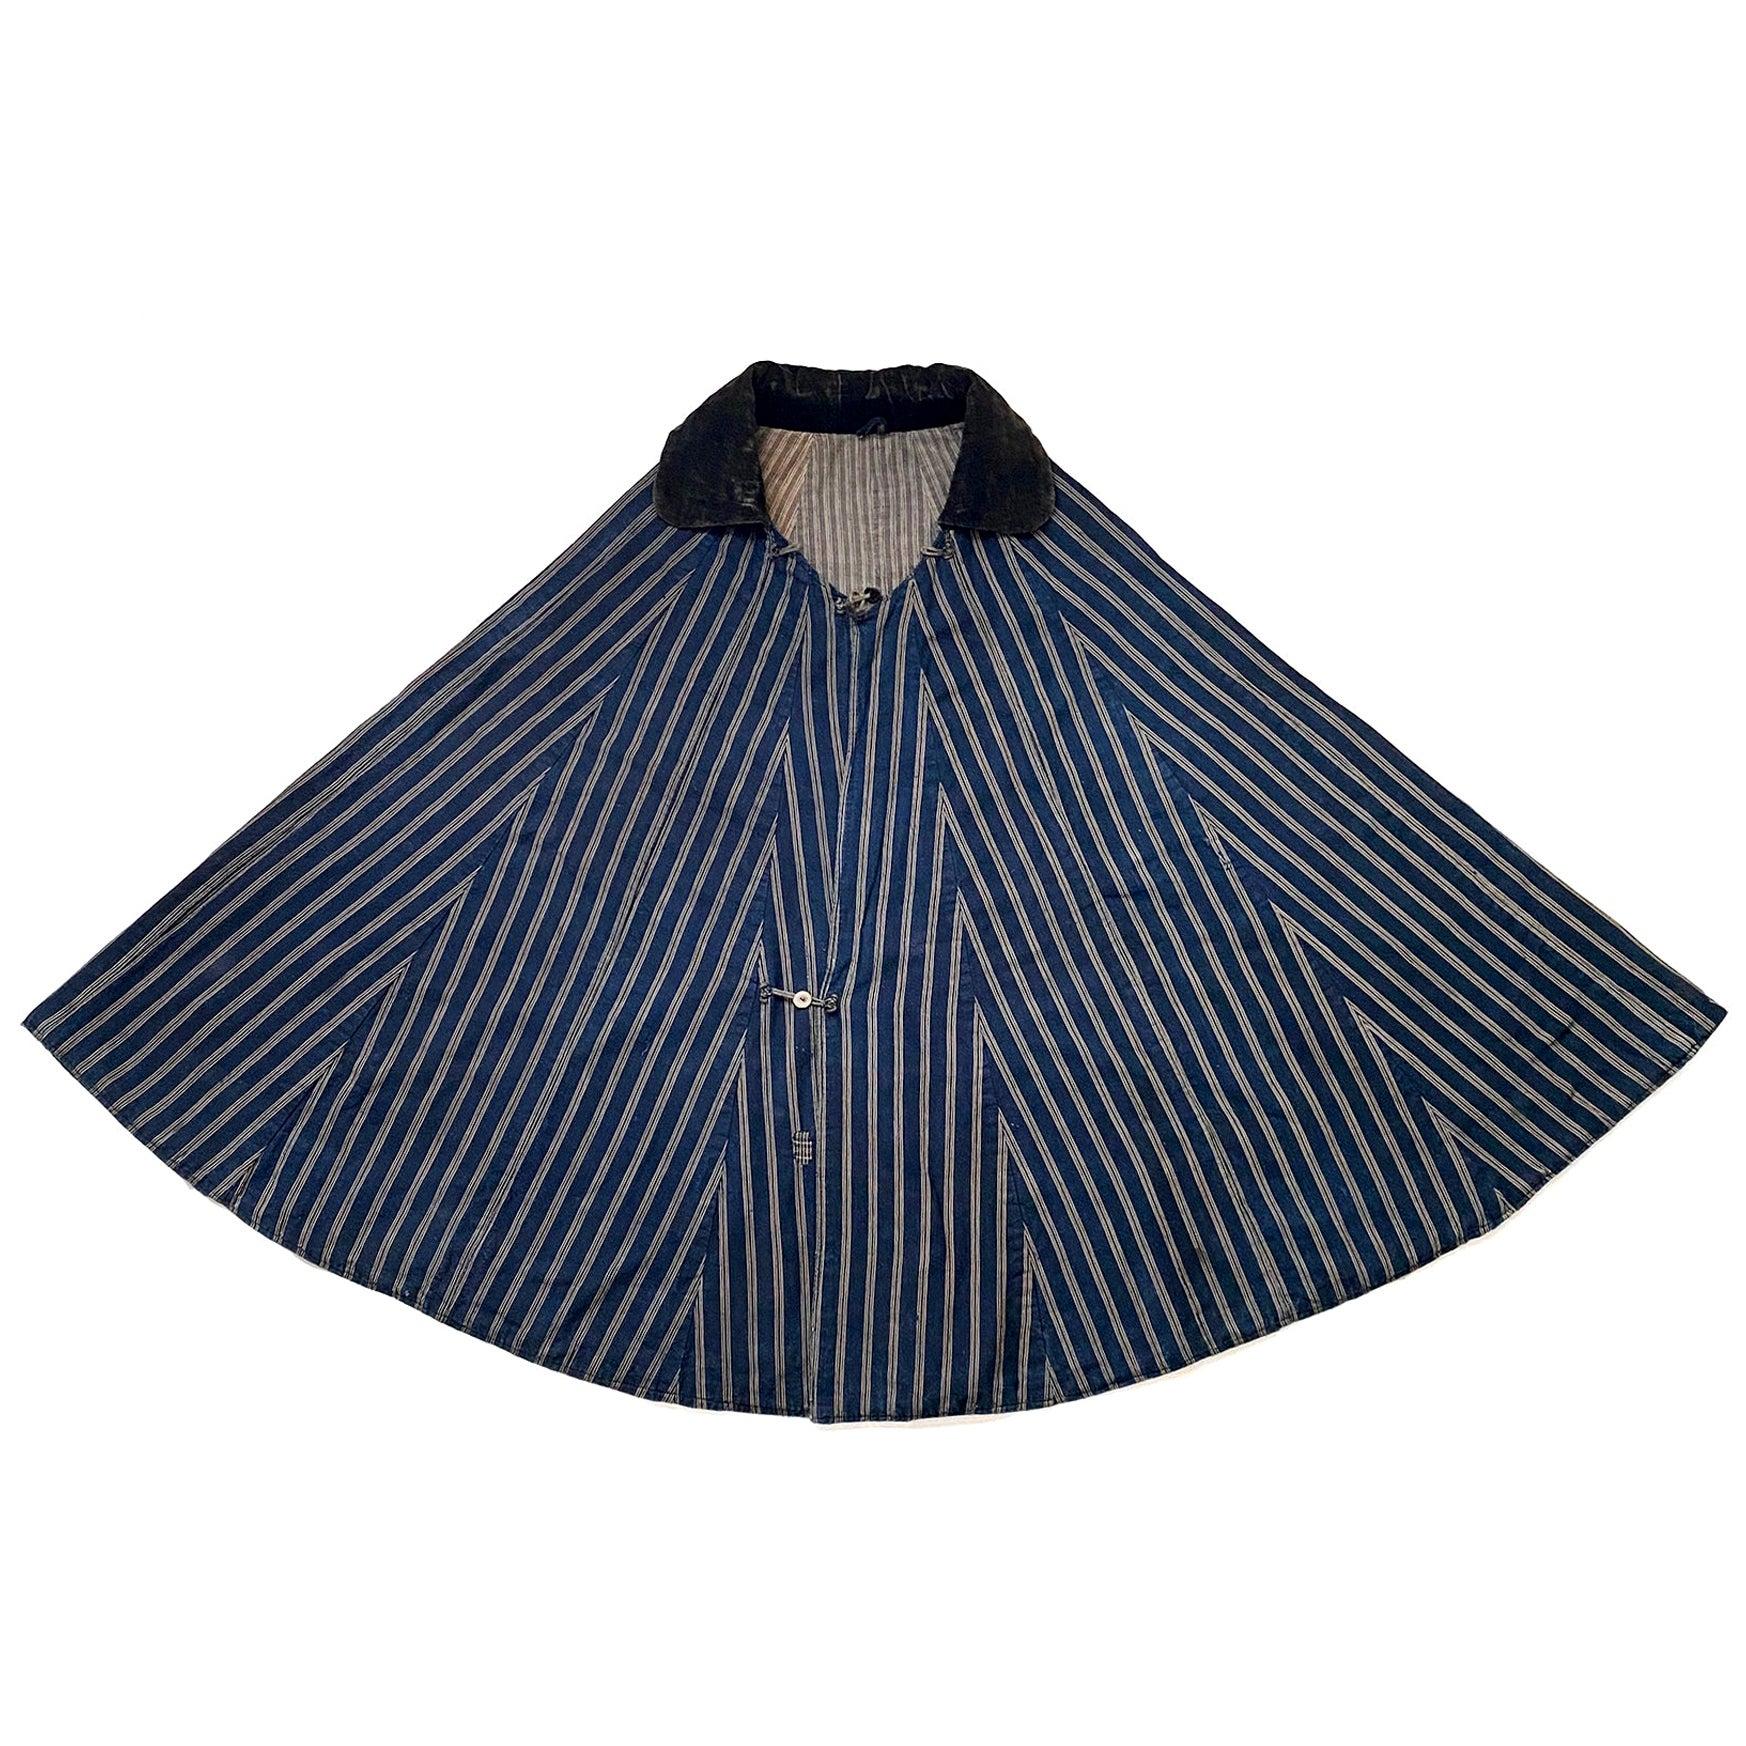 Meiji Period Cotton Kappa 'Rain Cape', Japan